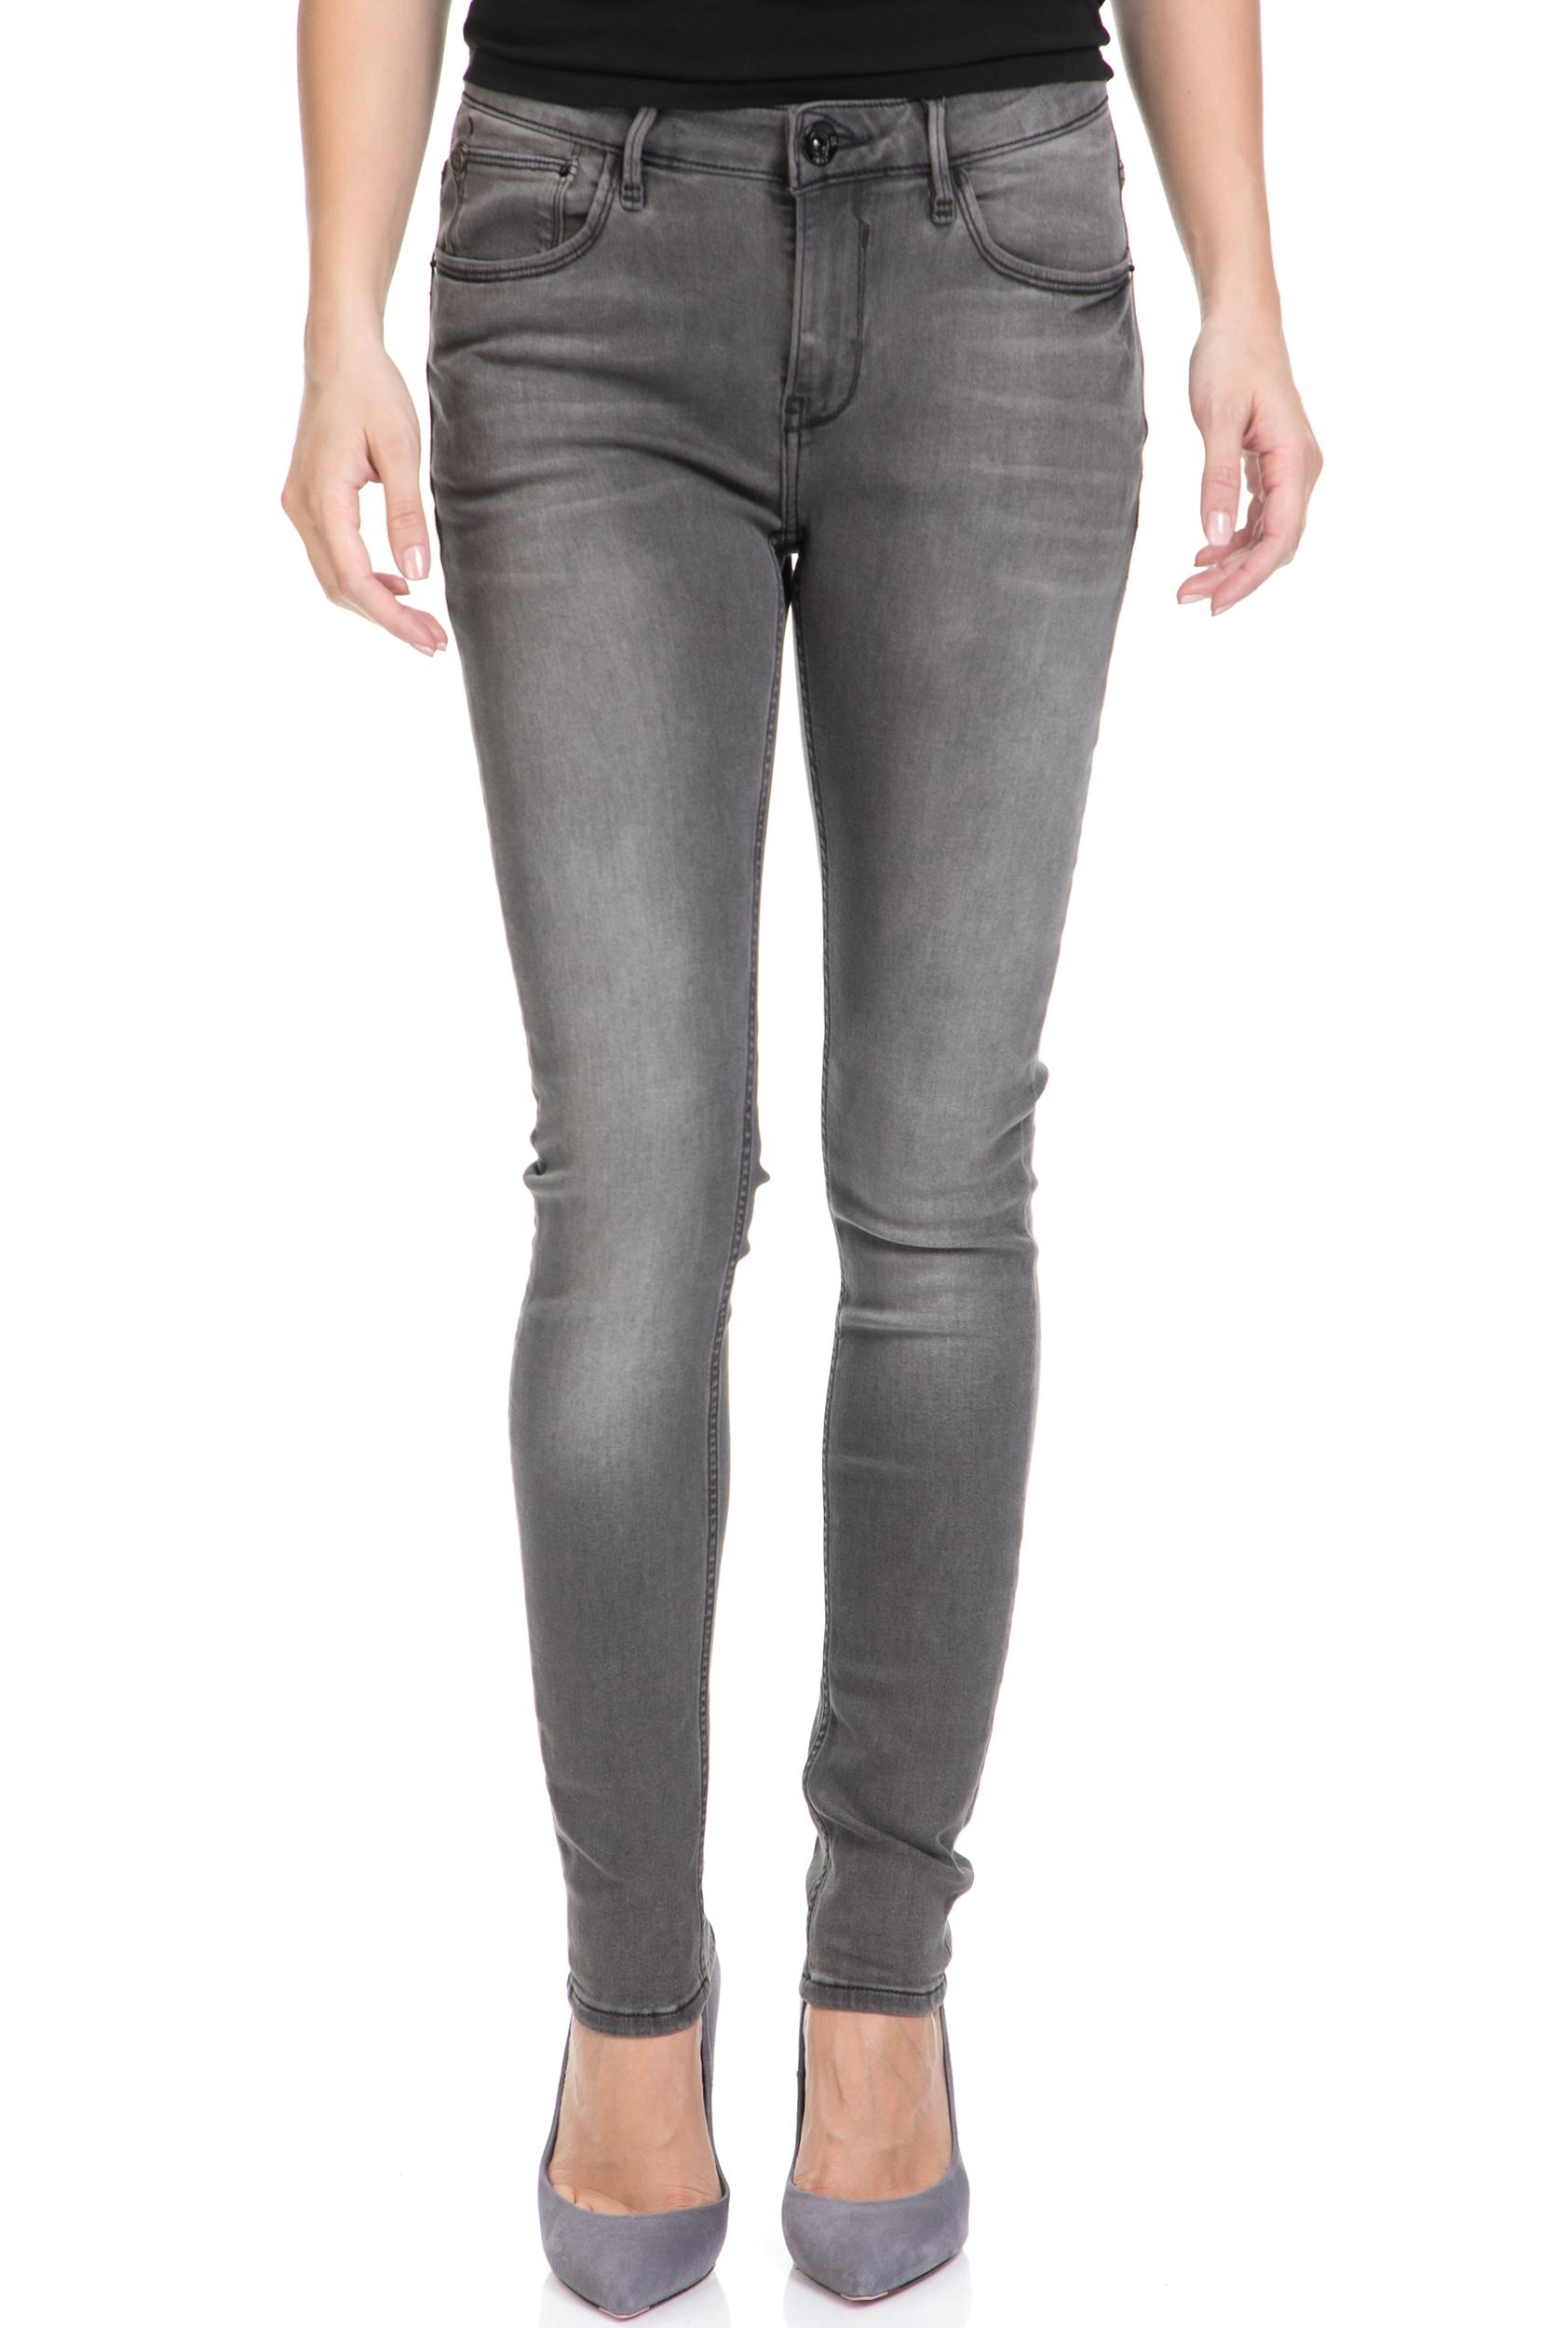 GARCIA JEANS - Γυναικείο τζιν παντελόνι Celia GRACIA JEANS γκρι γυναικεία ρούχα τζίν skinny